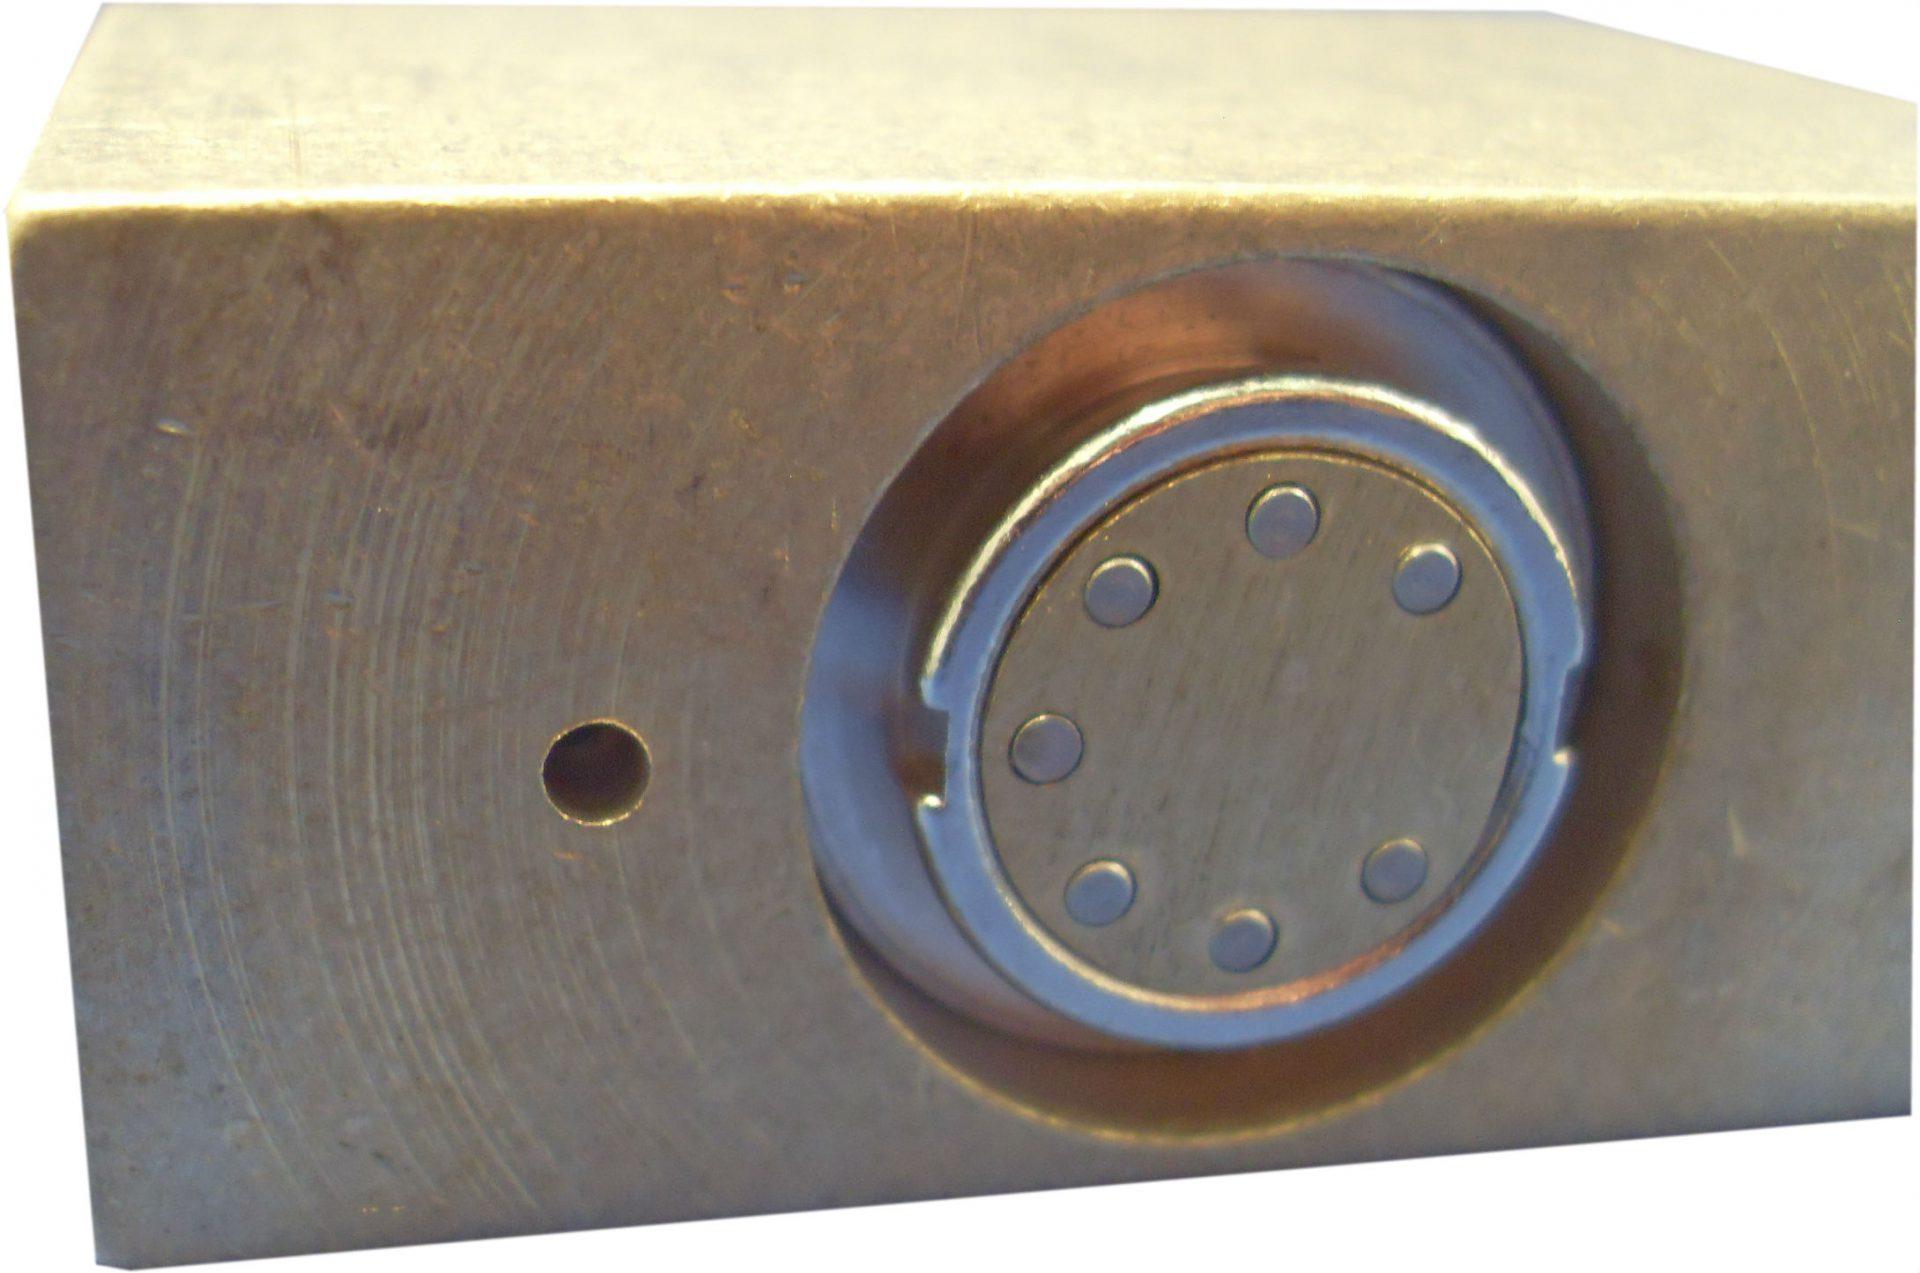 Vanlock Brass Padlocks for Utilities